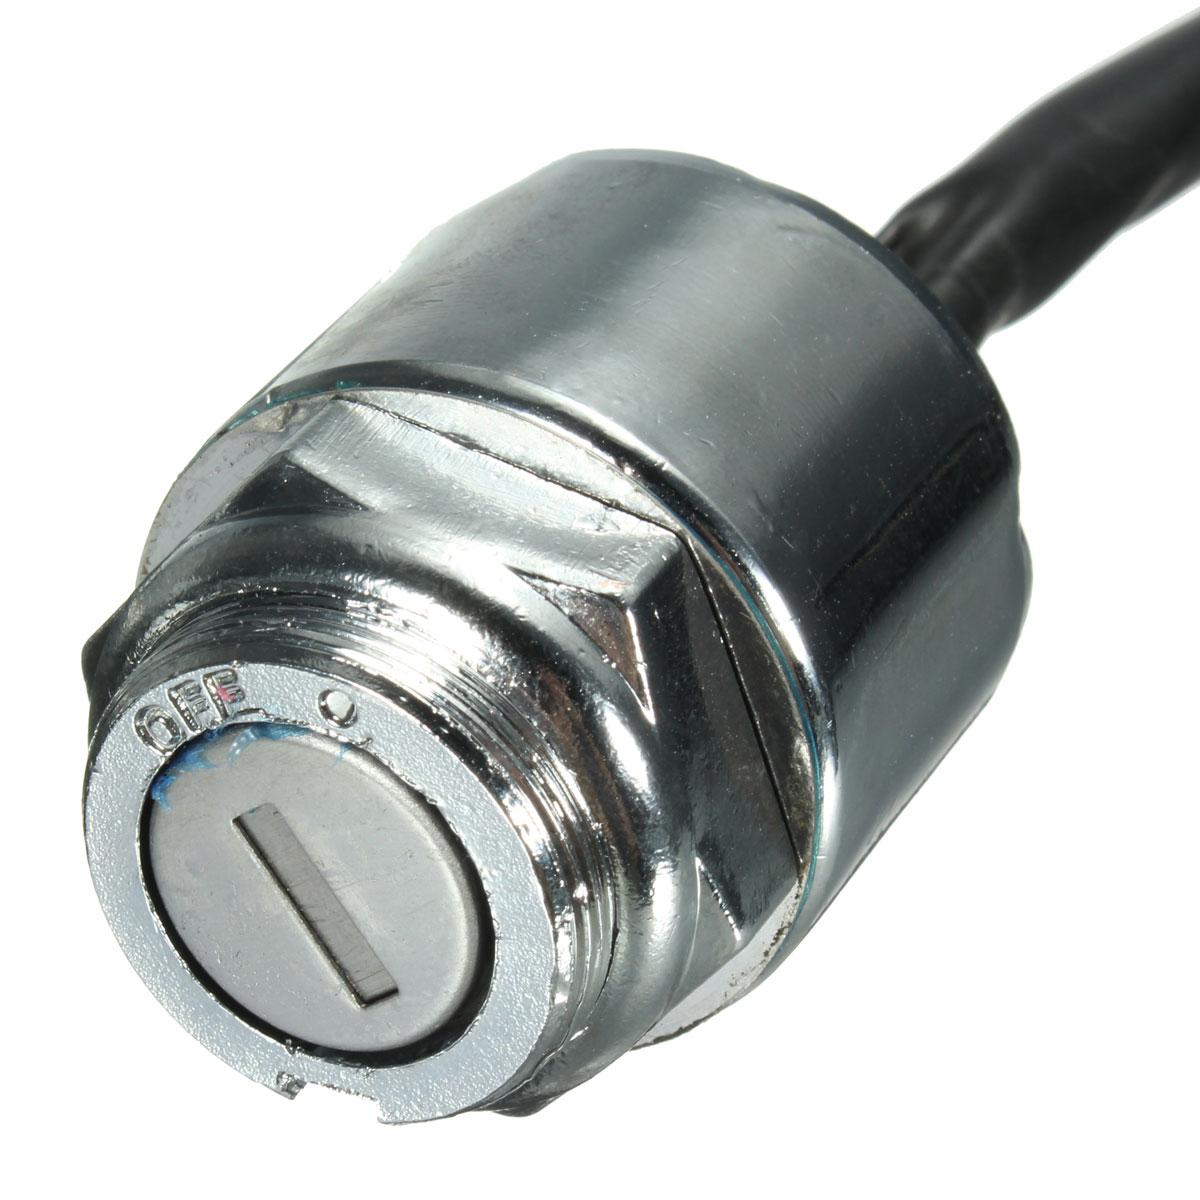 hight resolution of ignition barrel key switch 2 keys 4 pin block connector for atv mini moto dirt bike